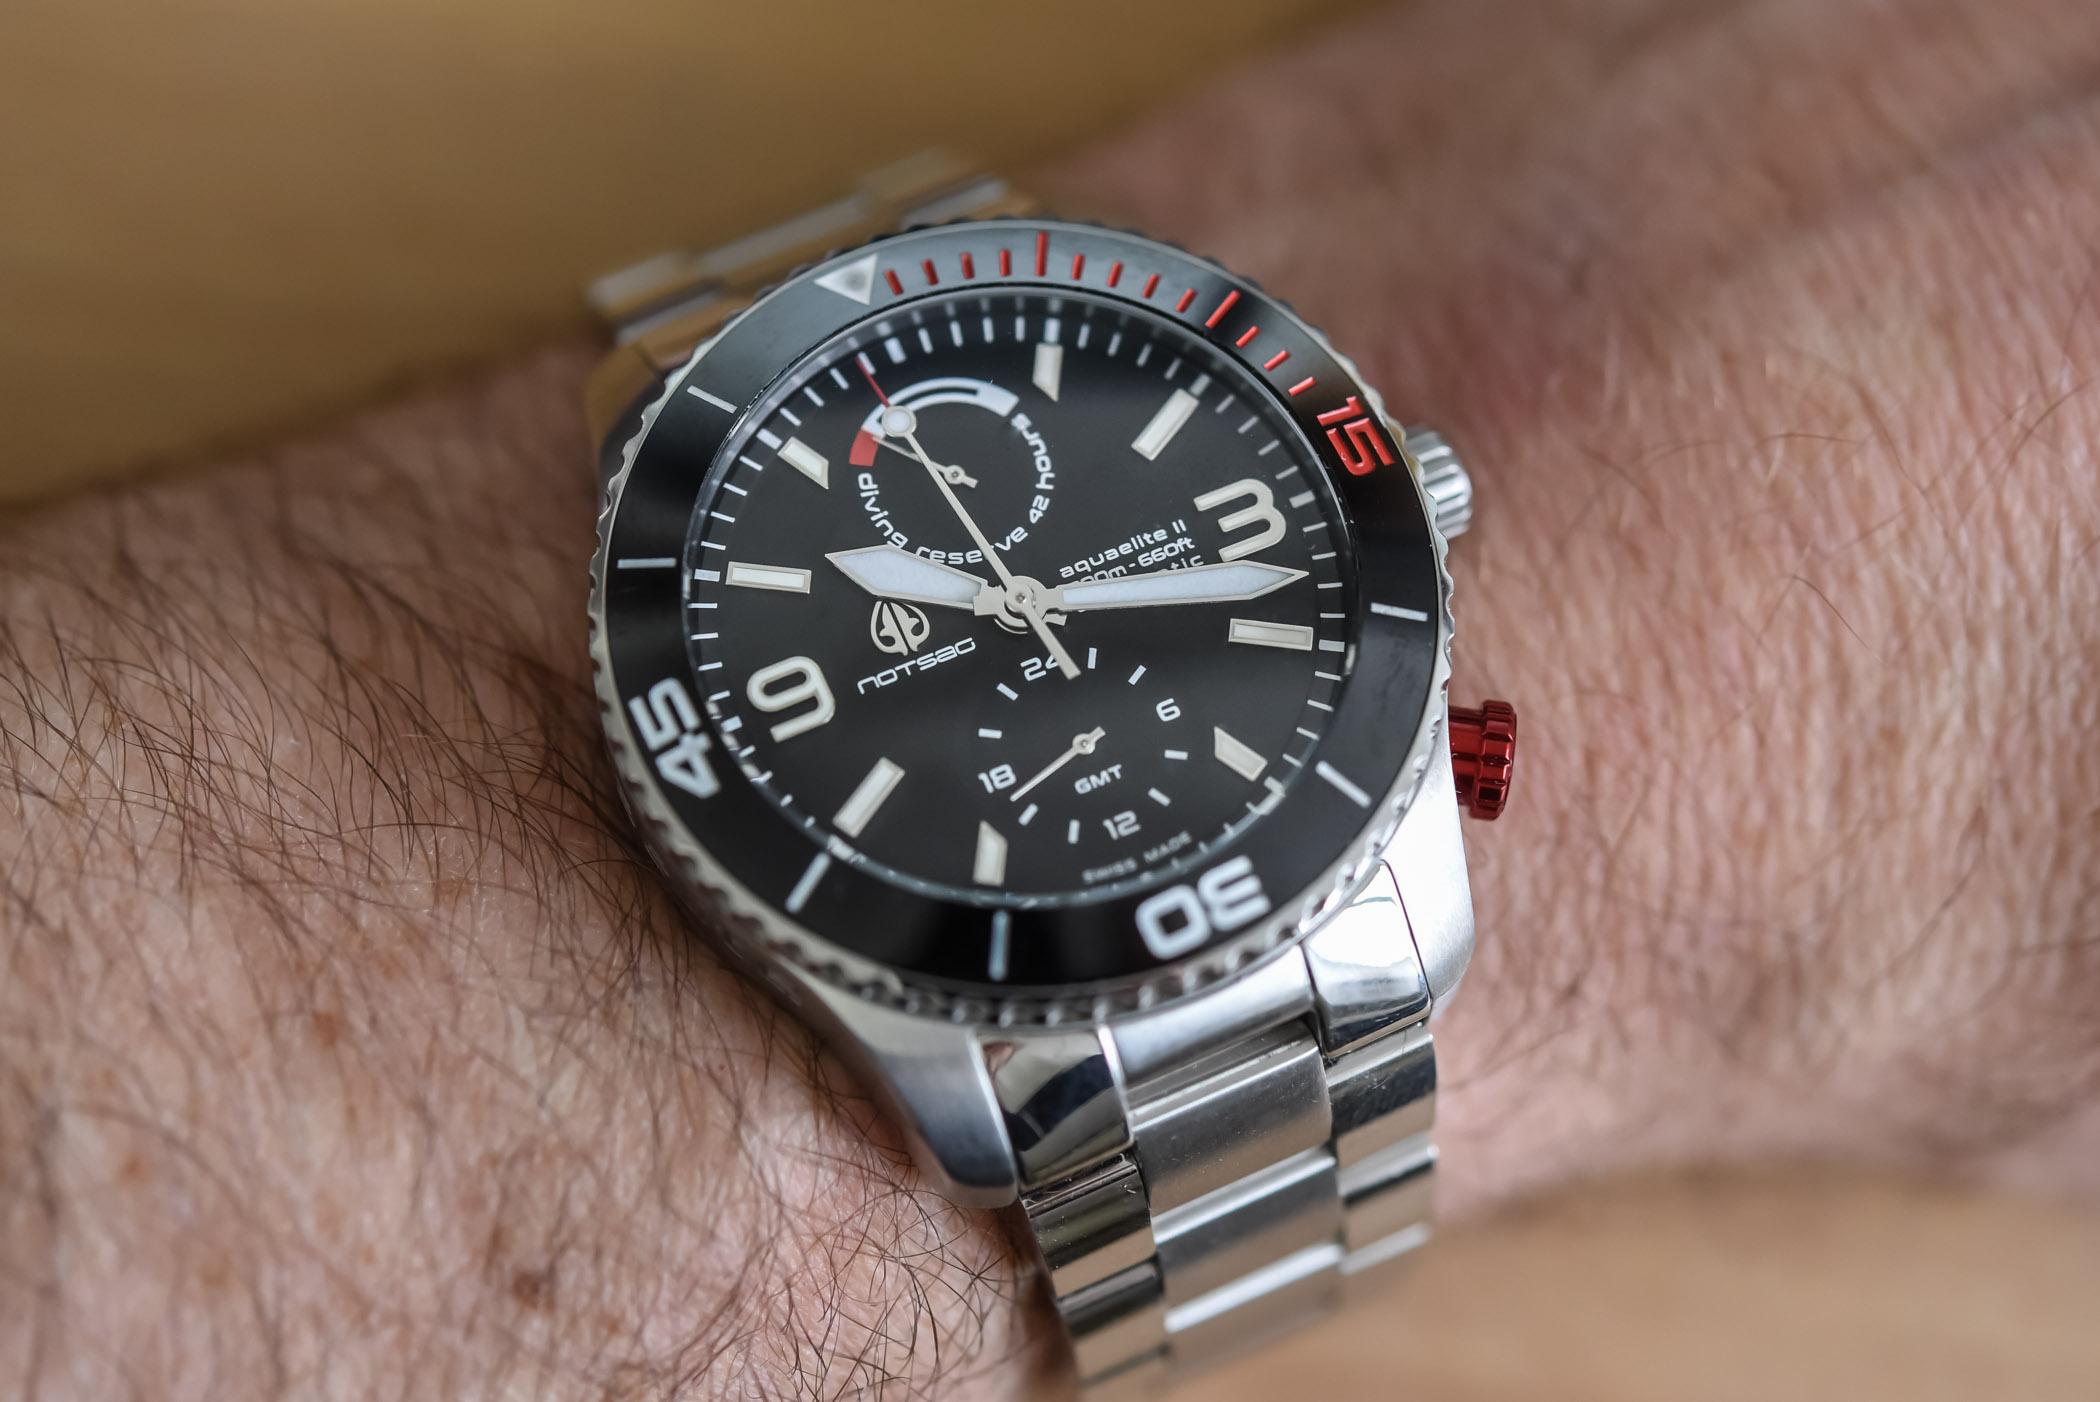 NOTSAG Aquaelite Type II GMT